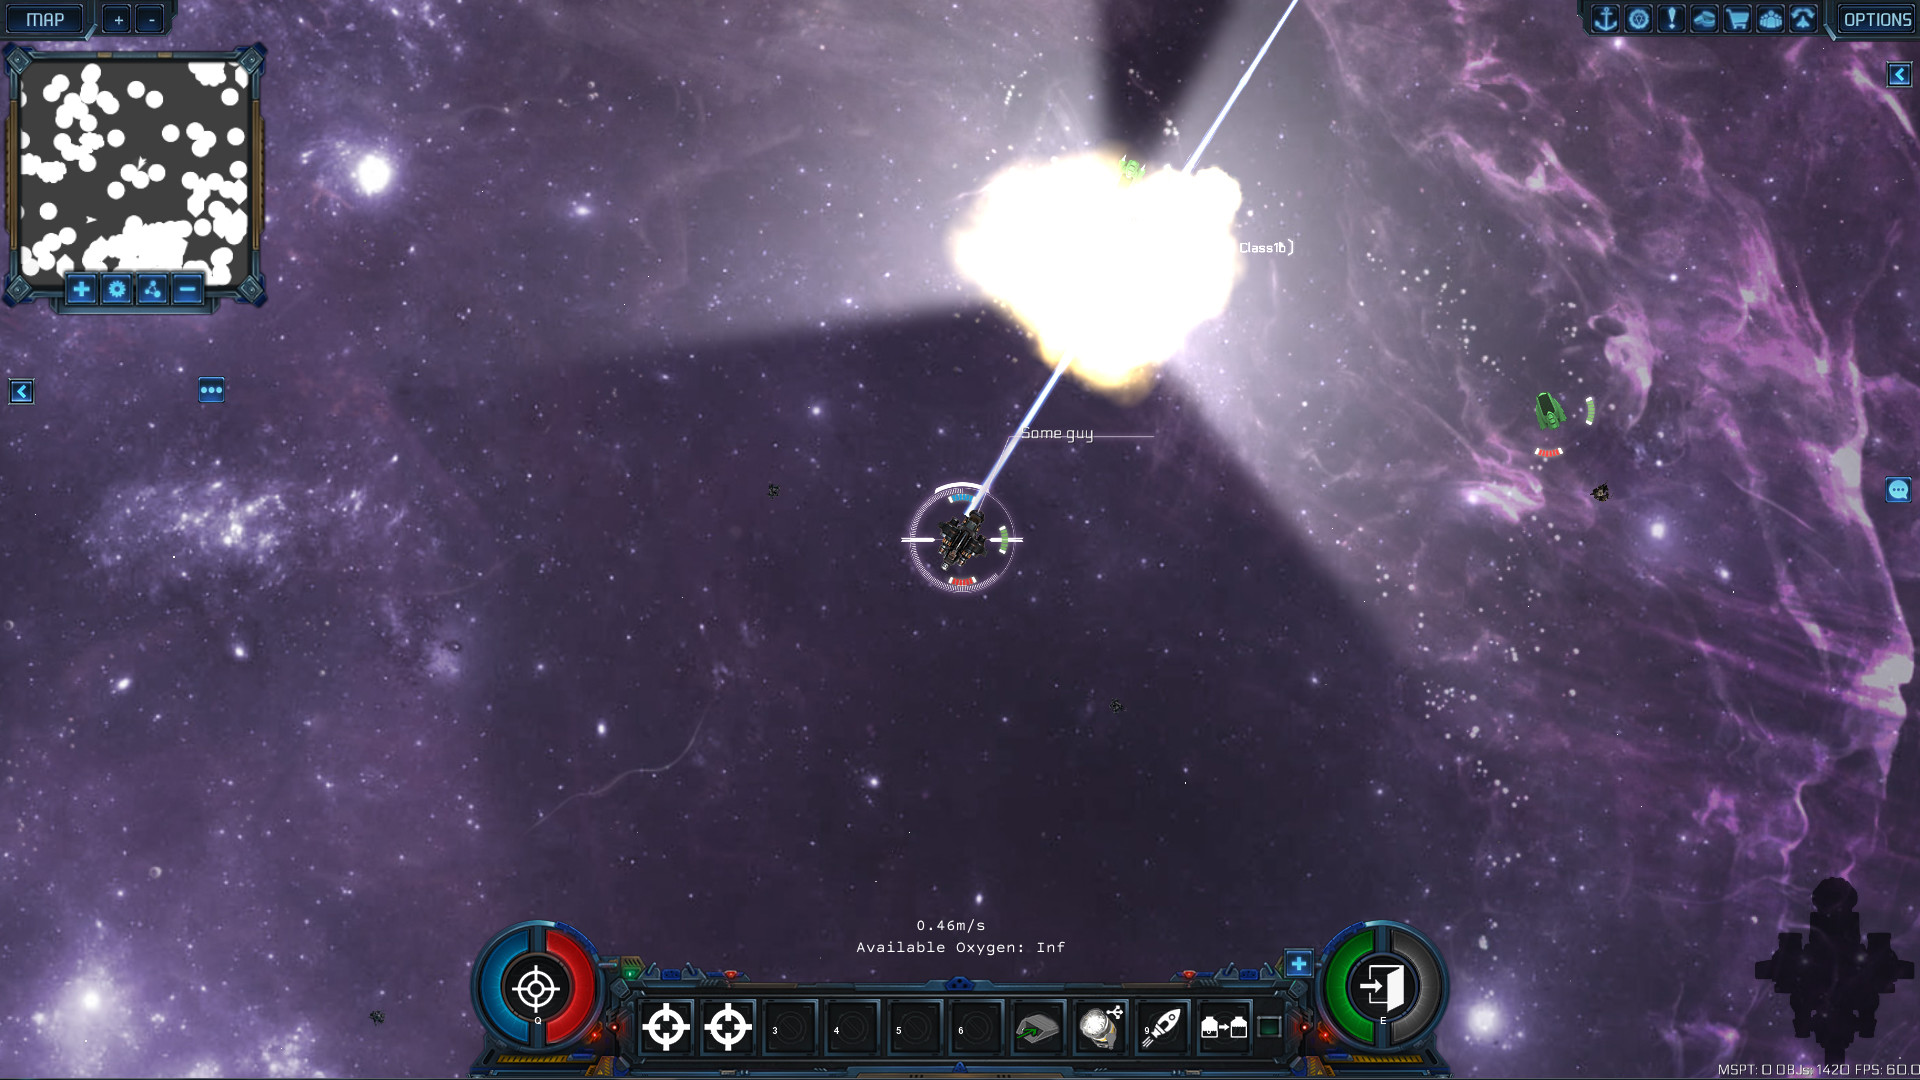 Voidspace screenshot